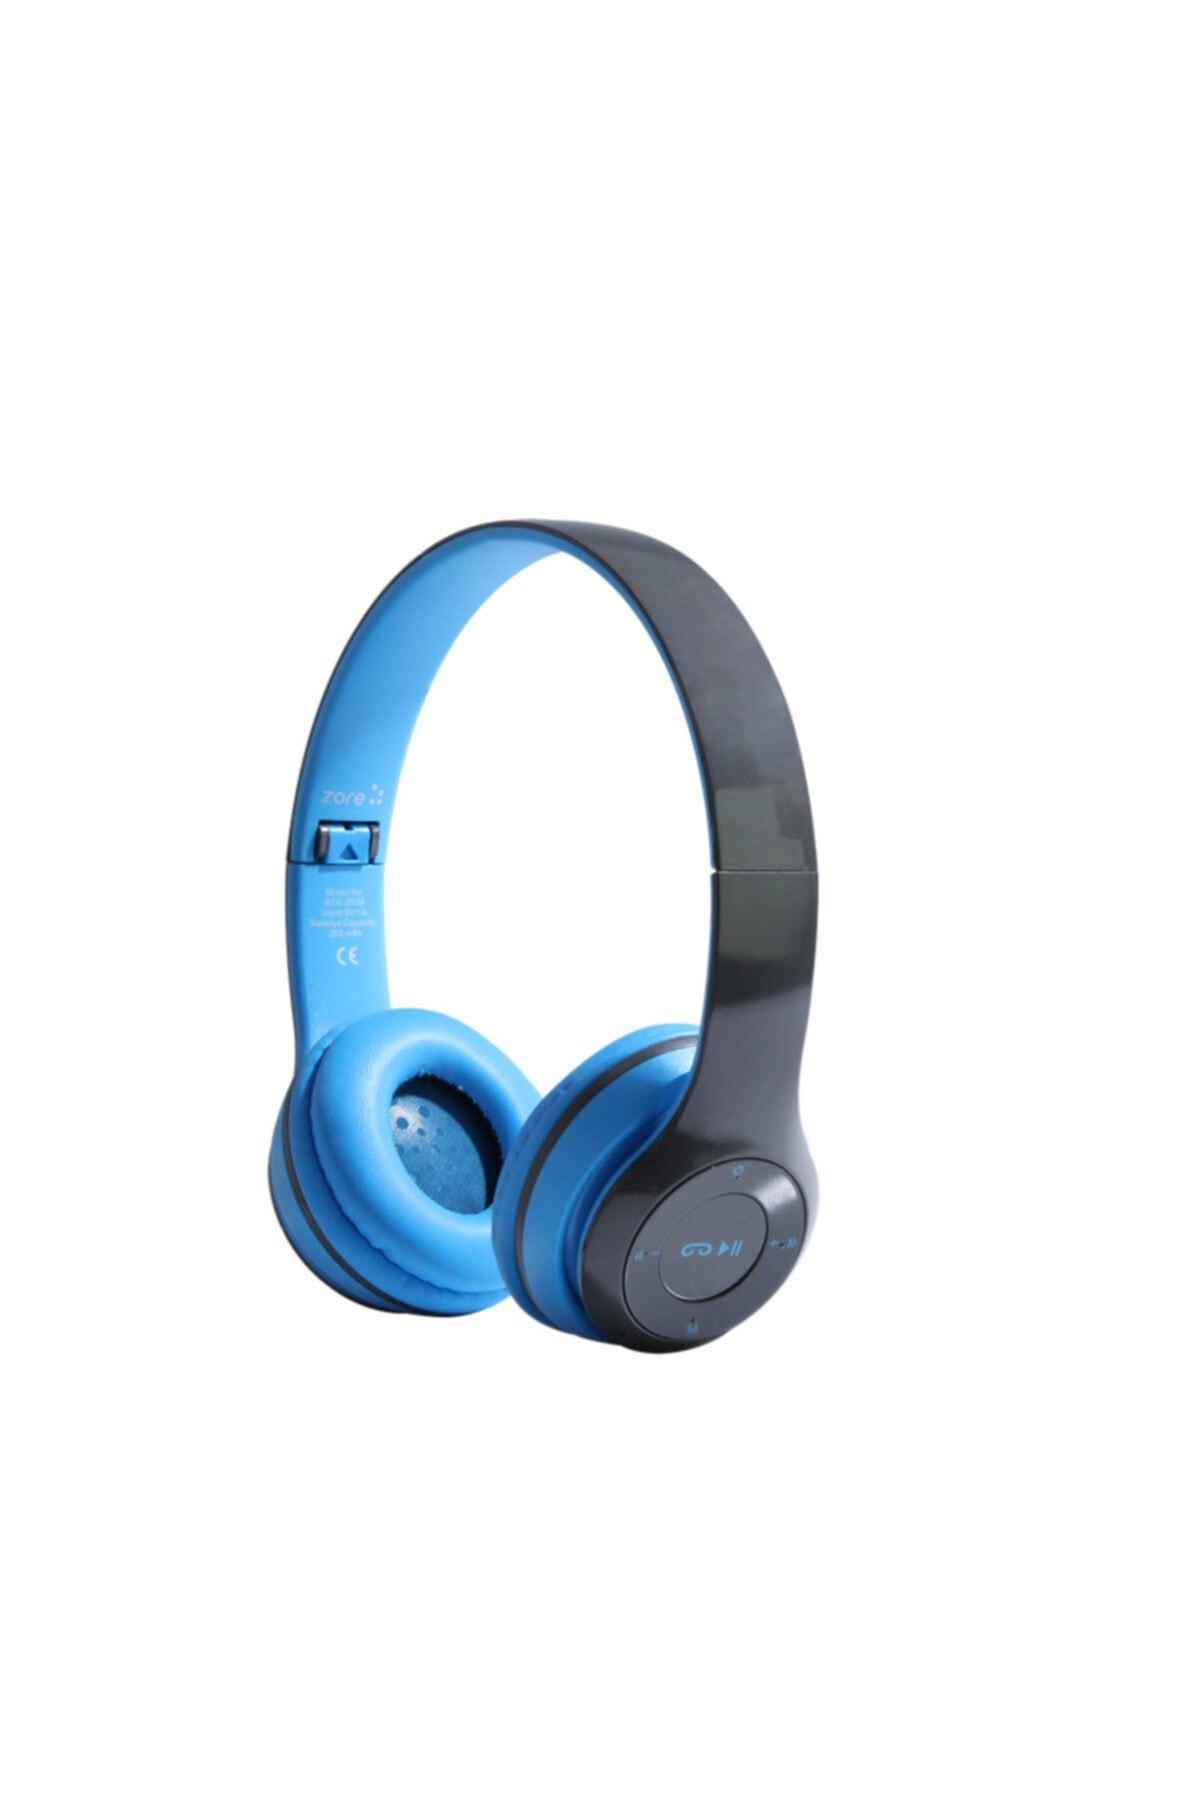 zore Bluetooth Kulaklık Kablosuz Müzik Oyuncu Kulaklığı Btk Serisi Head Phone 1